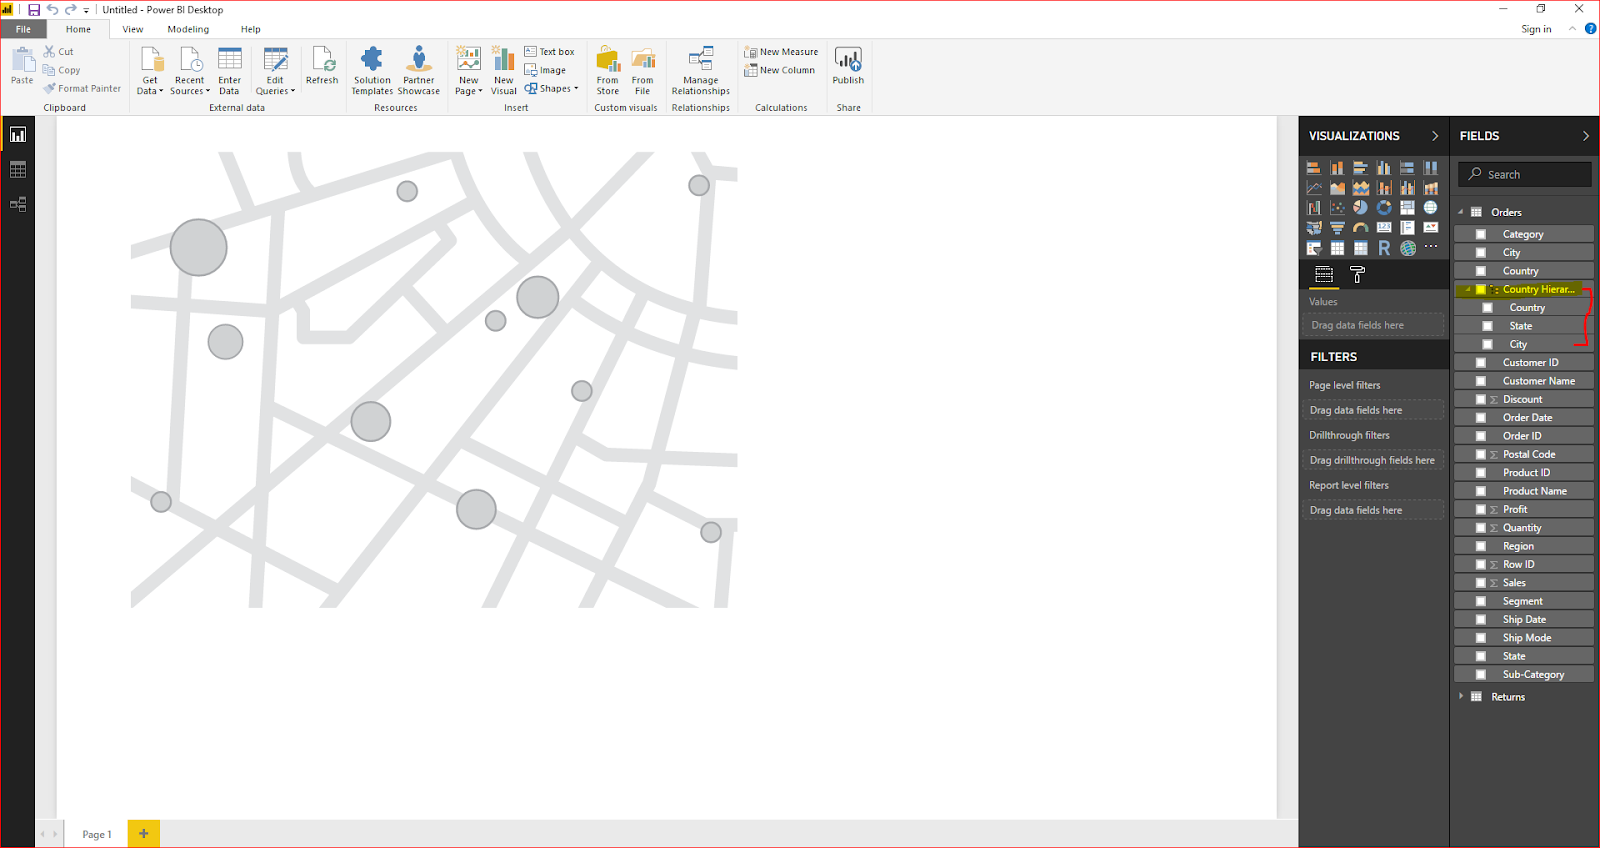 Maps & Hierarchy in Microsoft Power BI 33